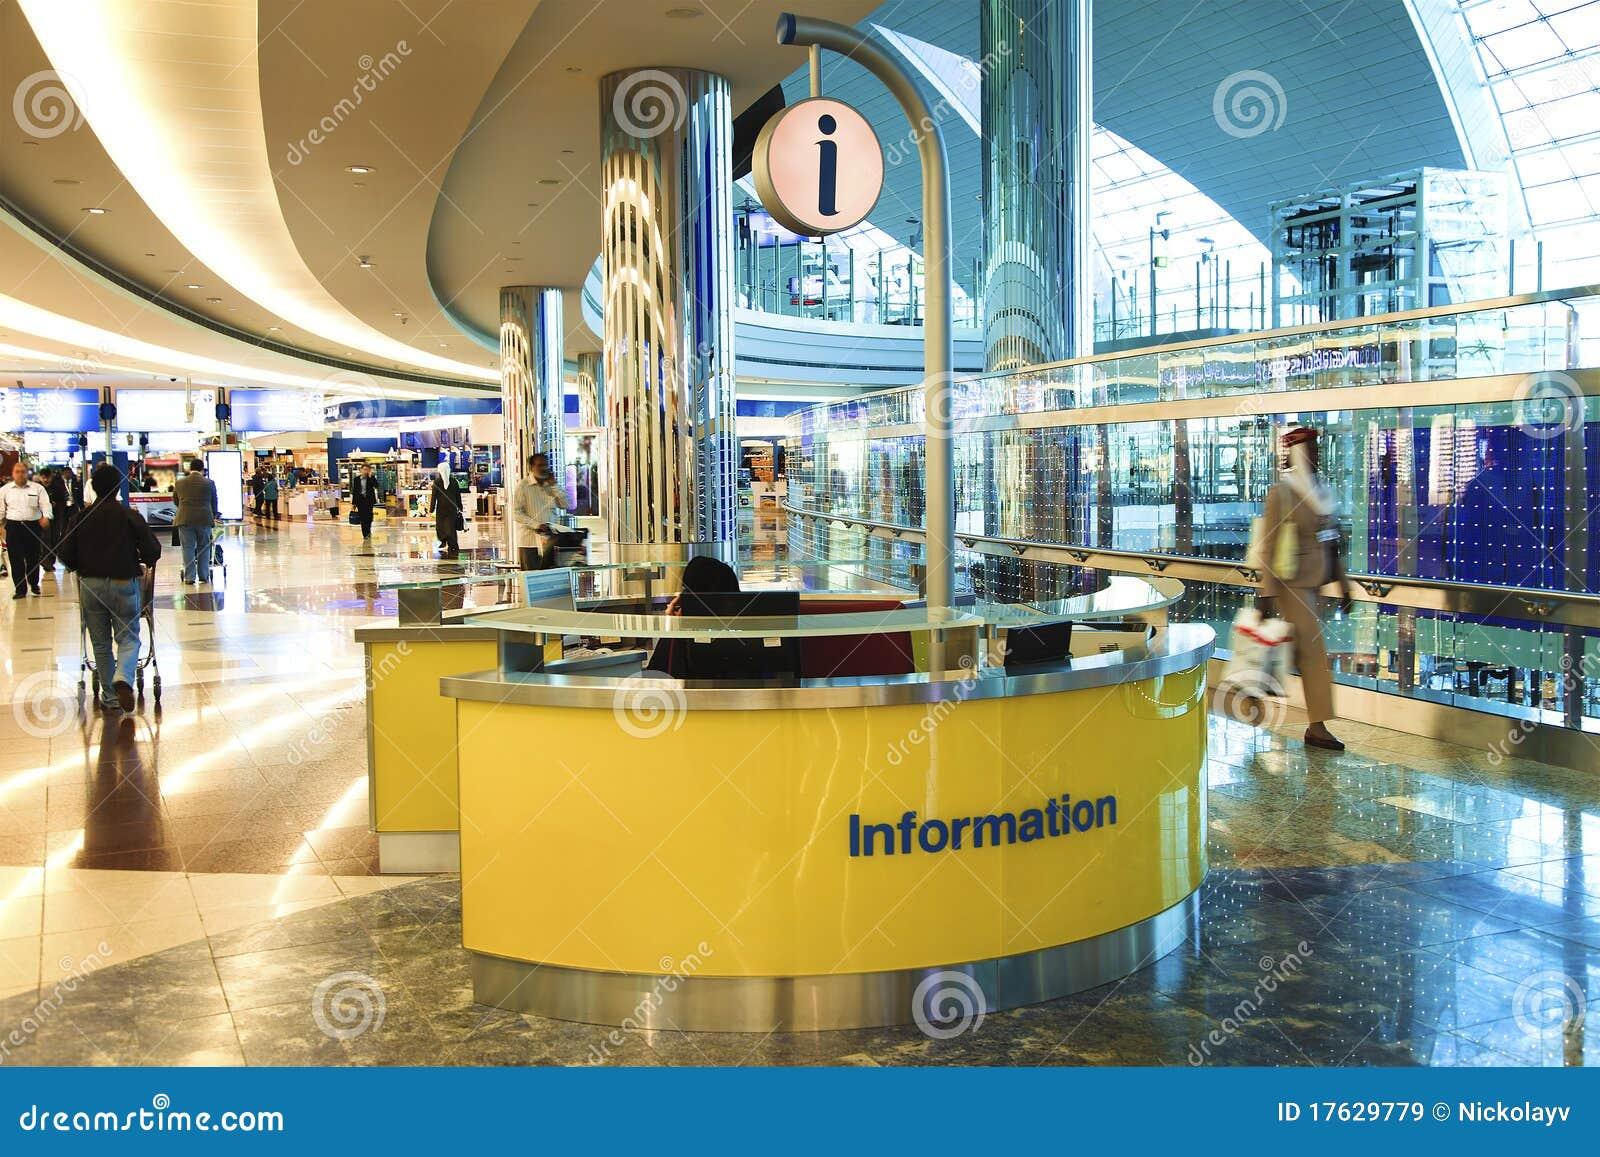 Information desk in dubai international airport editorial for International decor uae